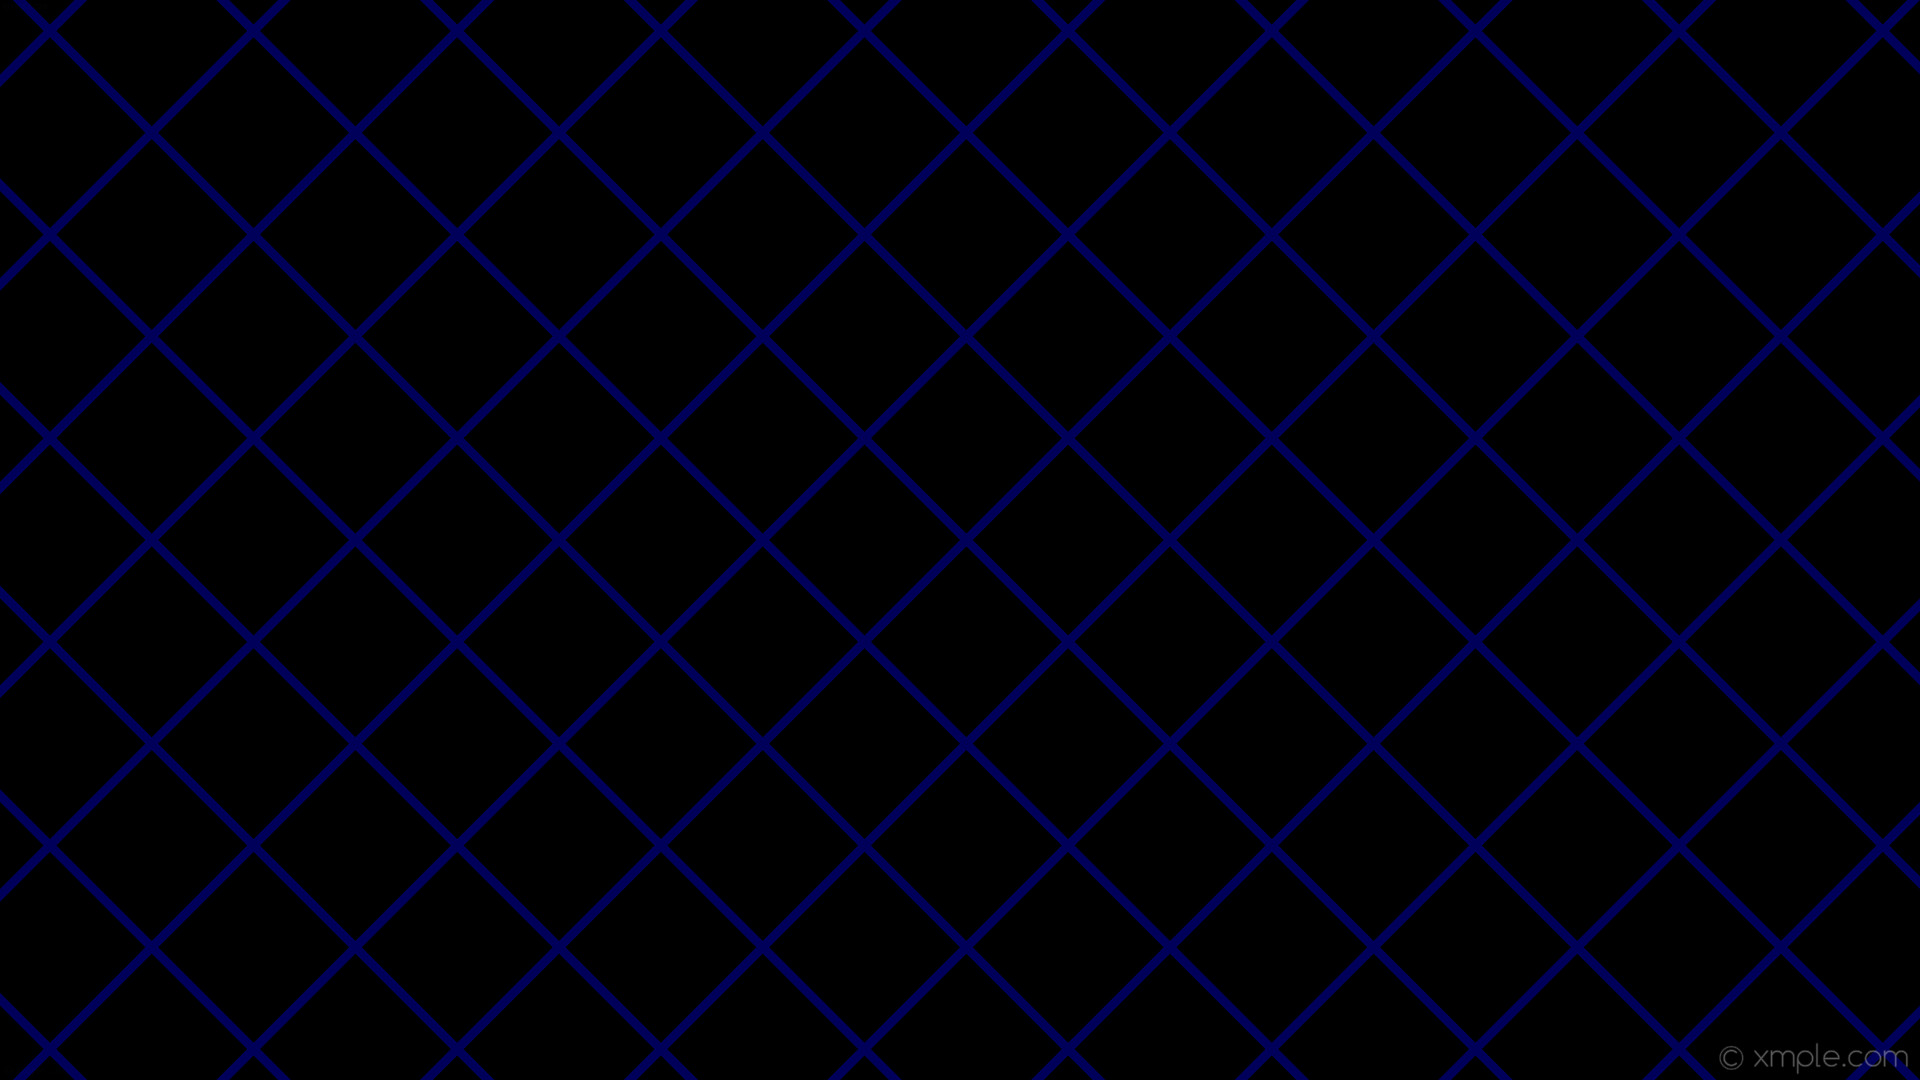 wallpaper graph paper blue black grid navy #000000 #000080 45° 9px 144px